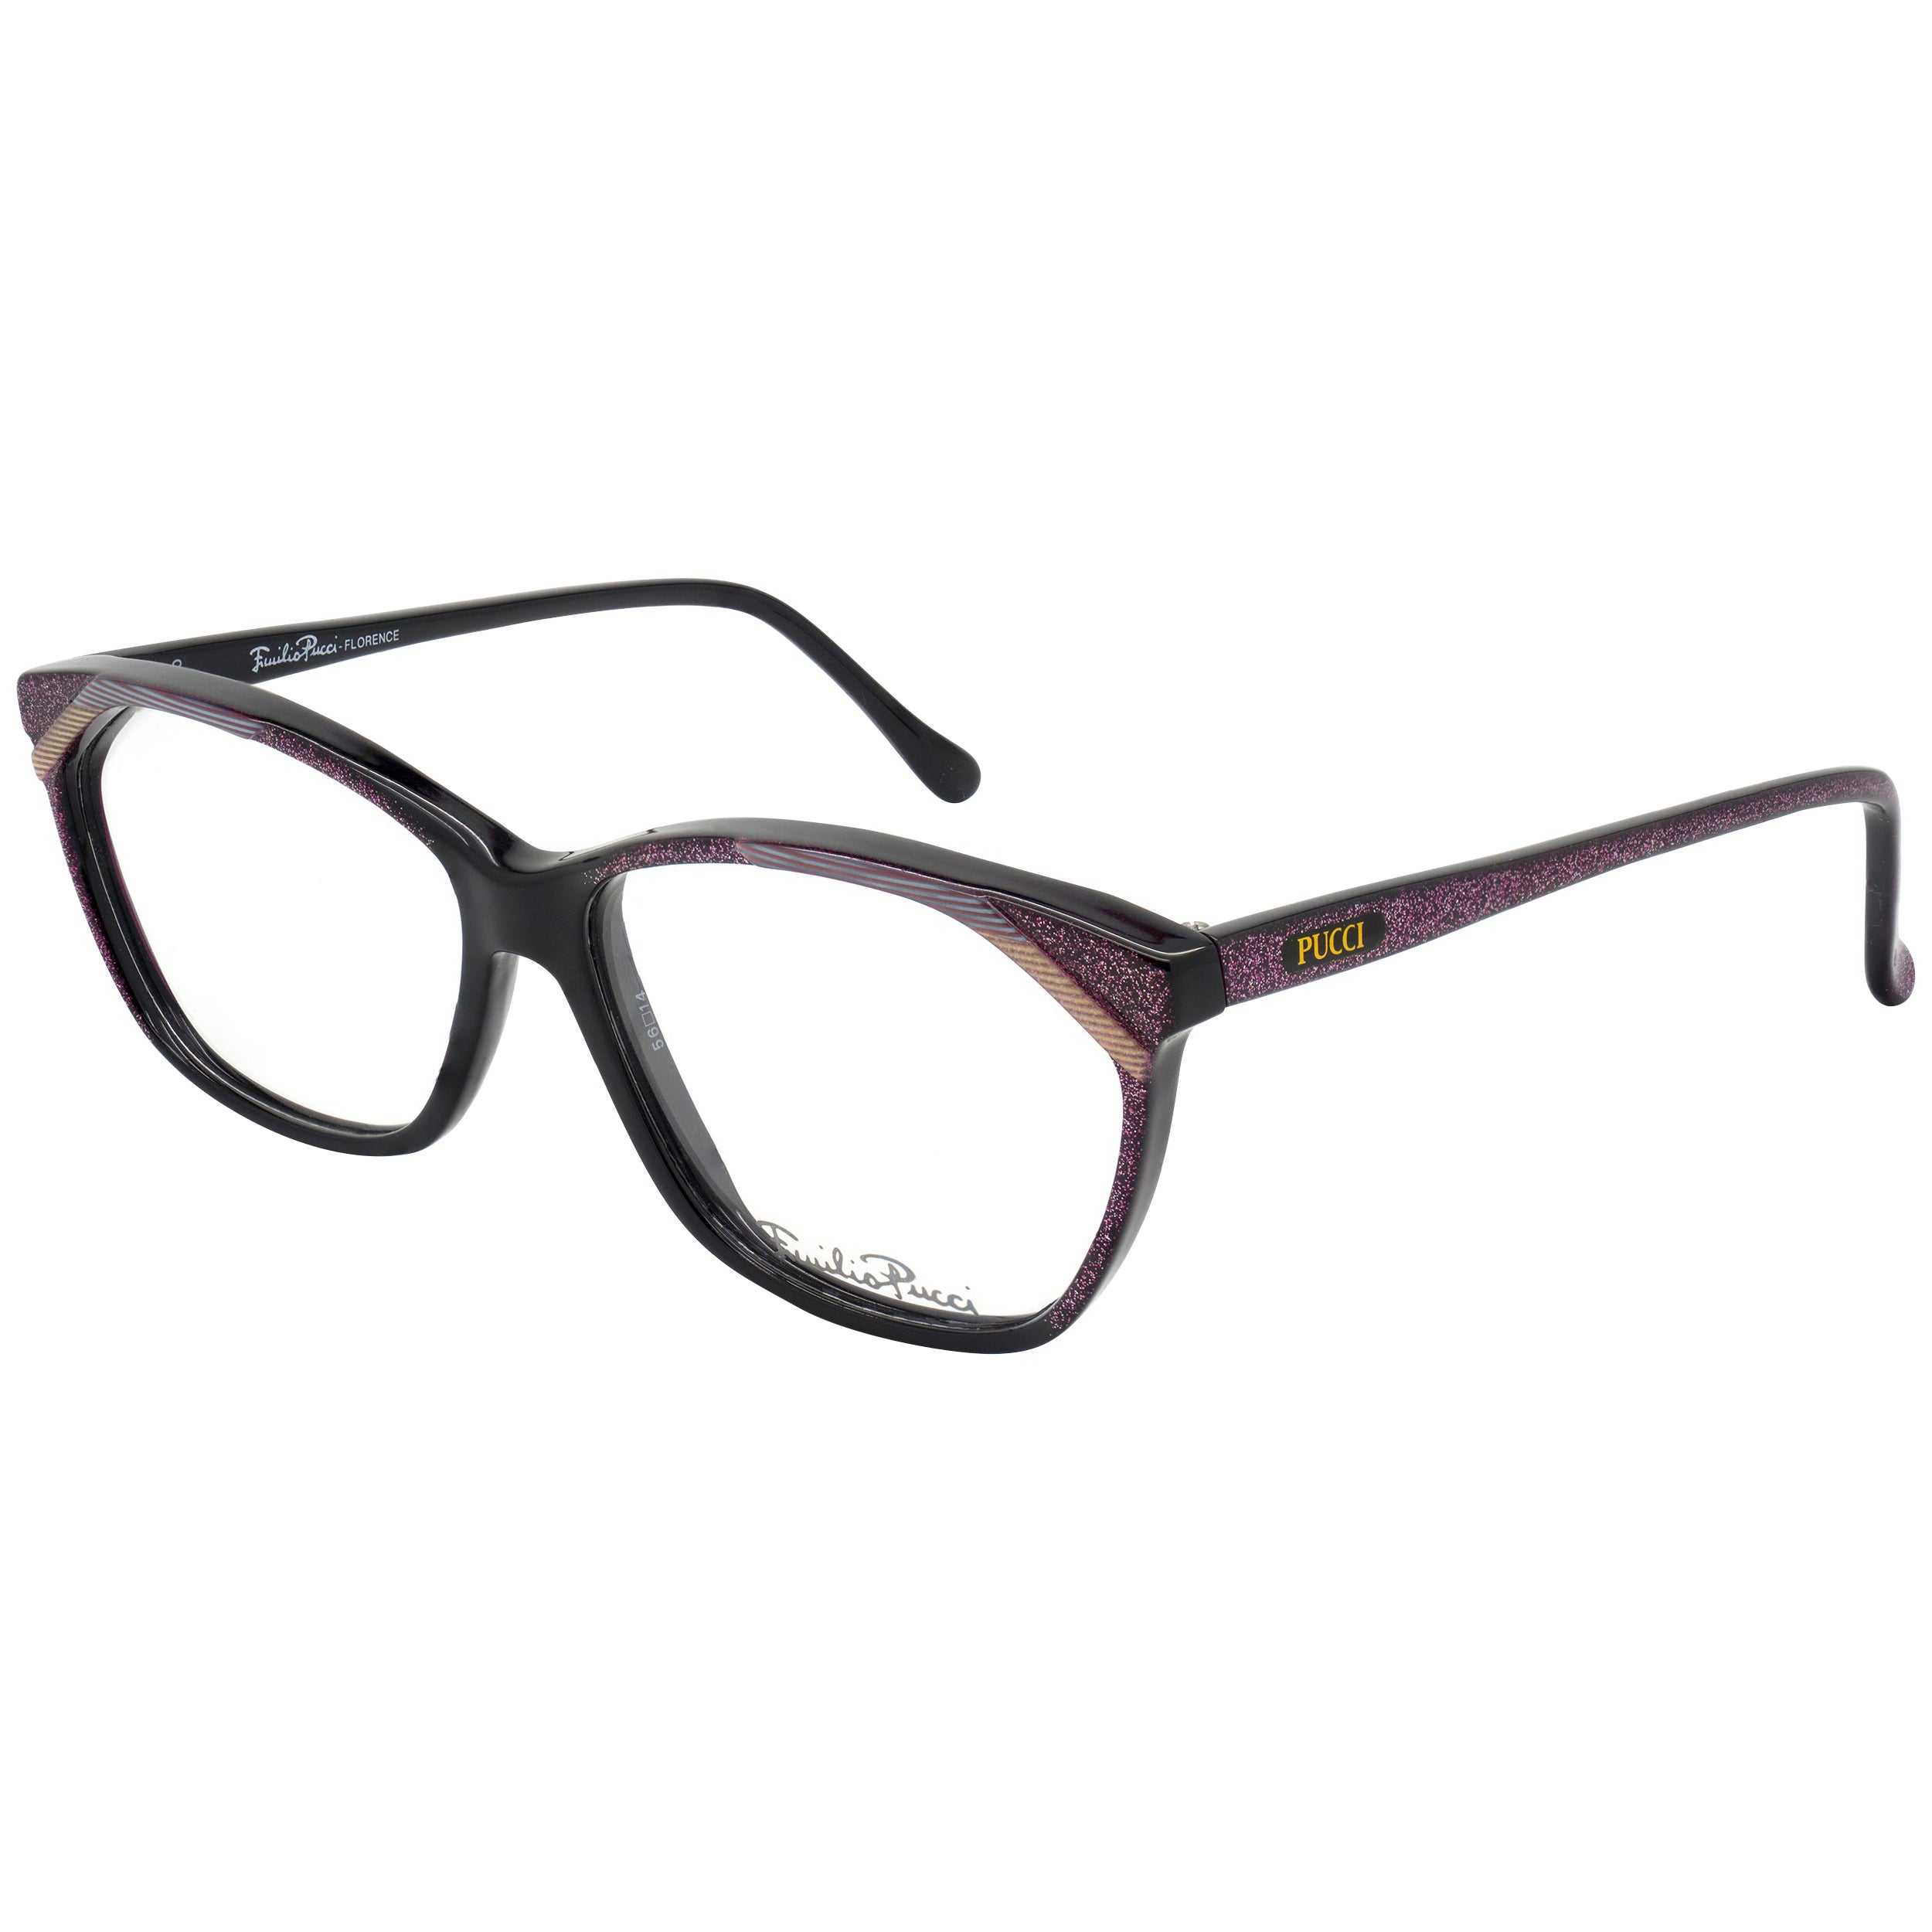 Emilio Pucci sparkling eyeglasses for women